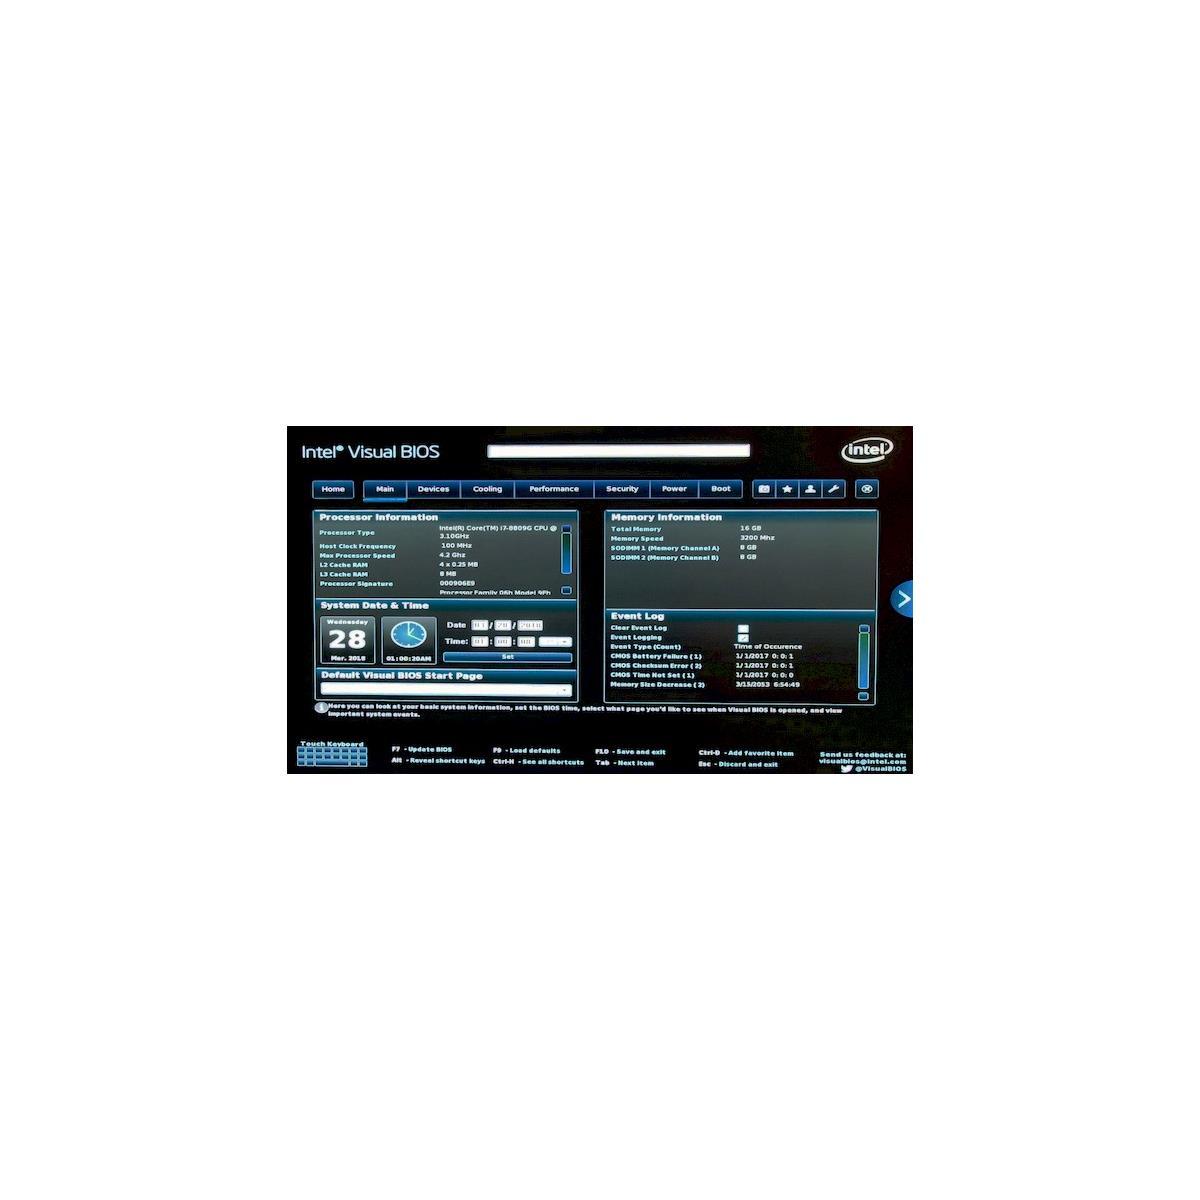 Intel Hades Canyon NUC8i7HVK Review: Pint-Sized Gaming Powerhouse